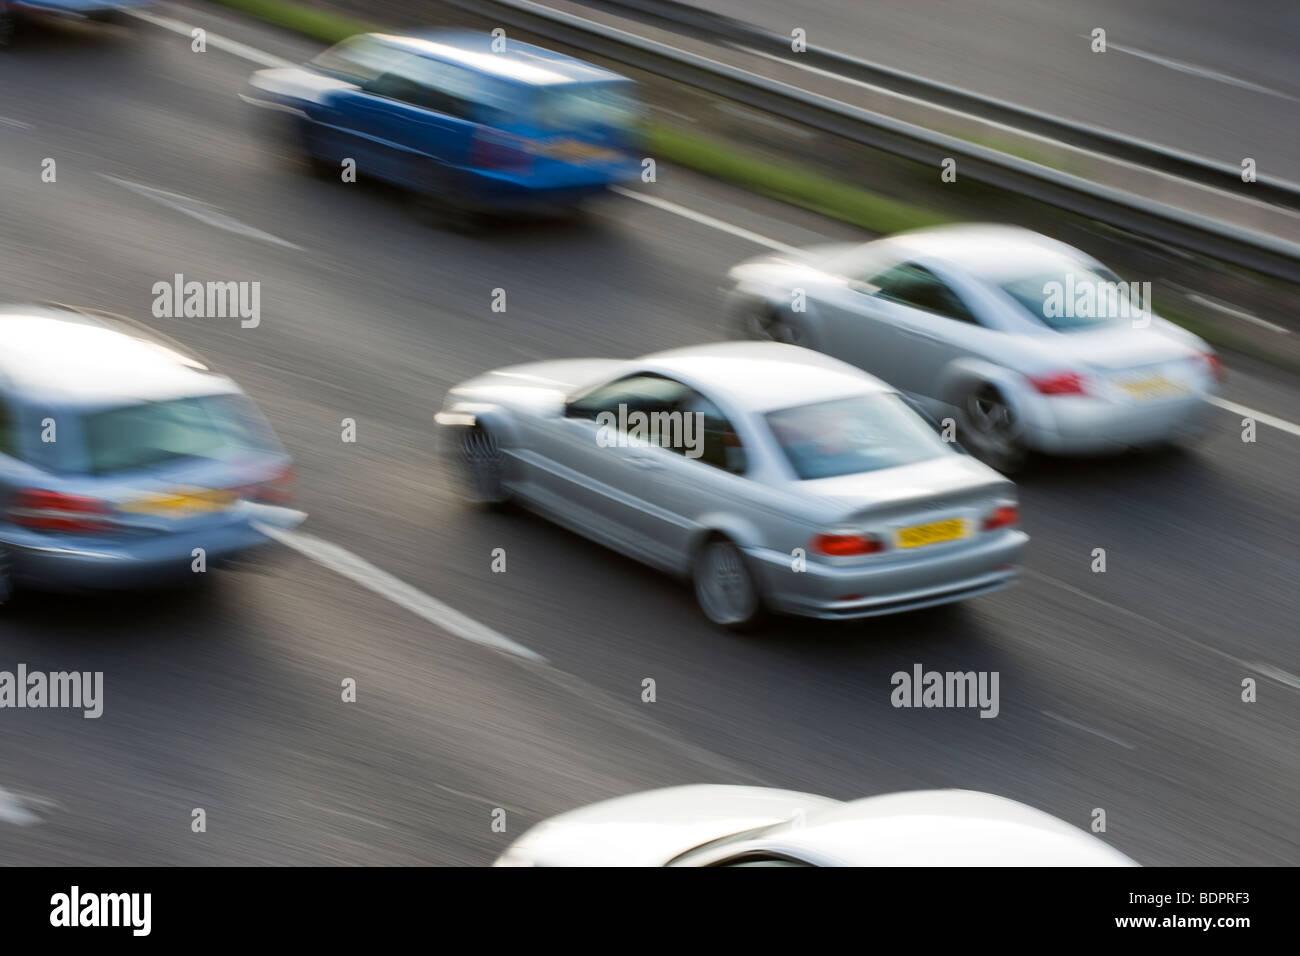 Cars on motorway. UK Stock Photo